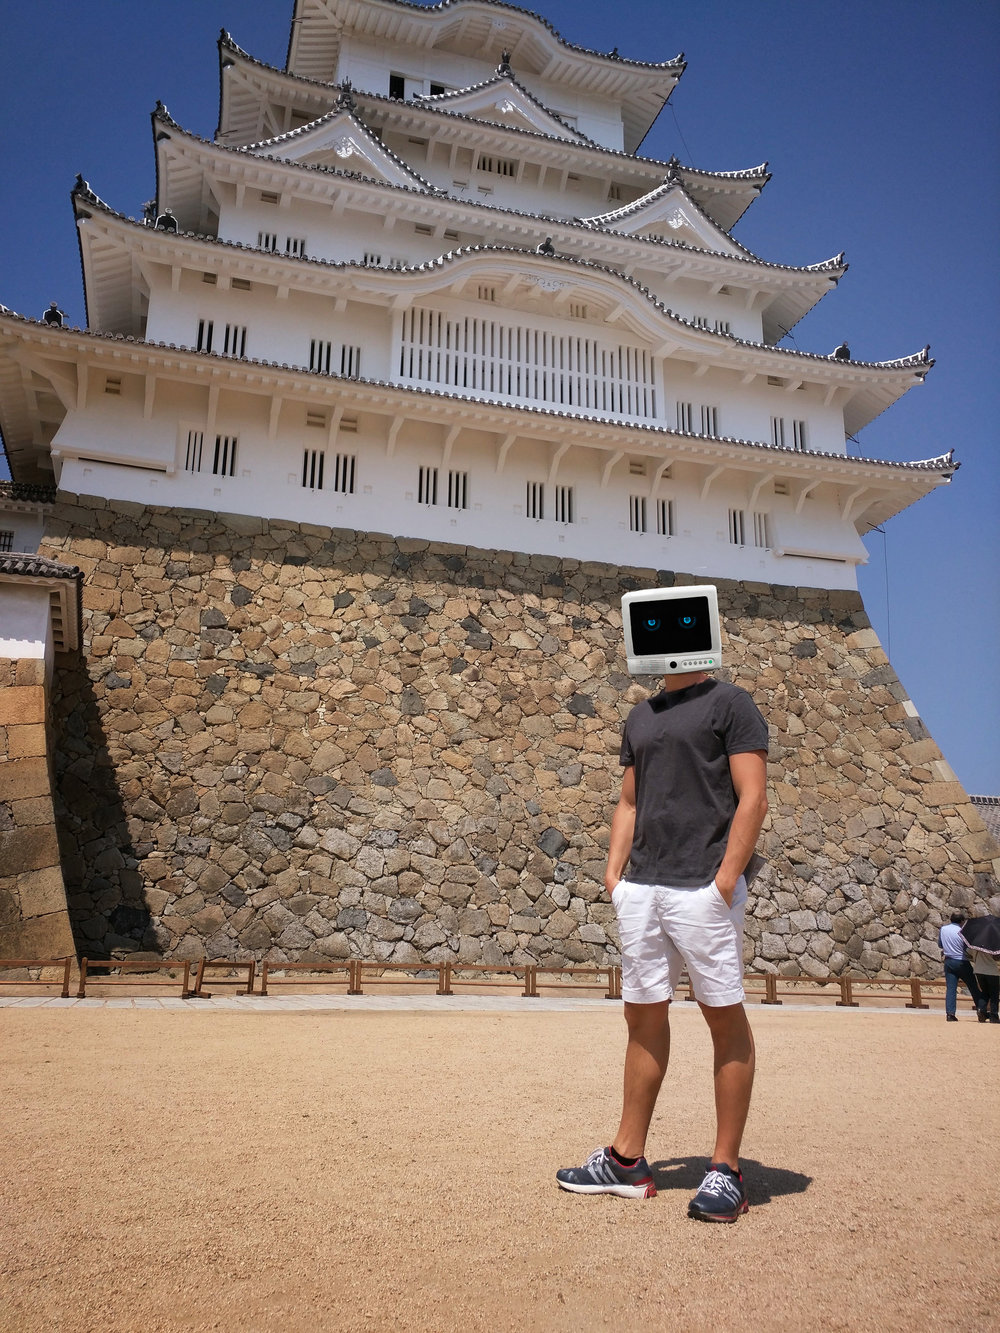 japan robot castle.jpg